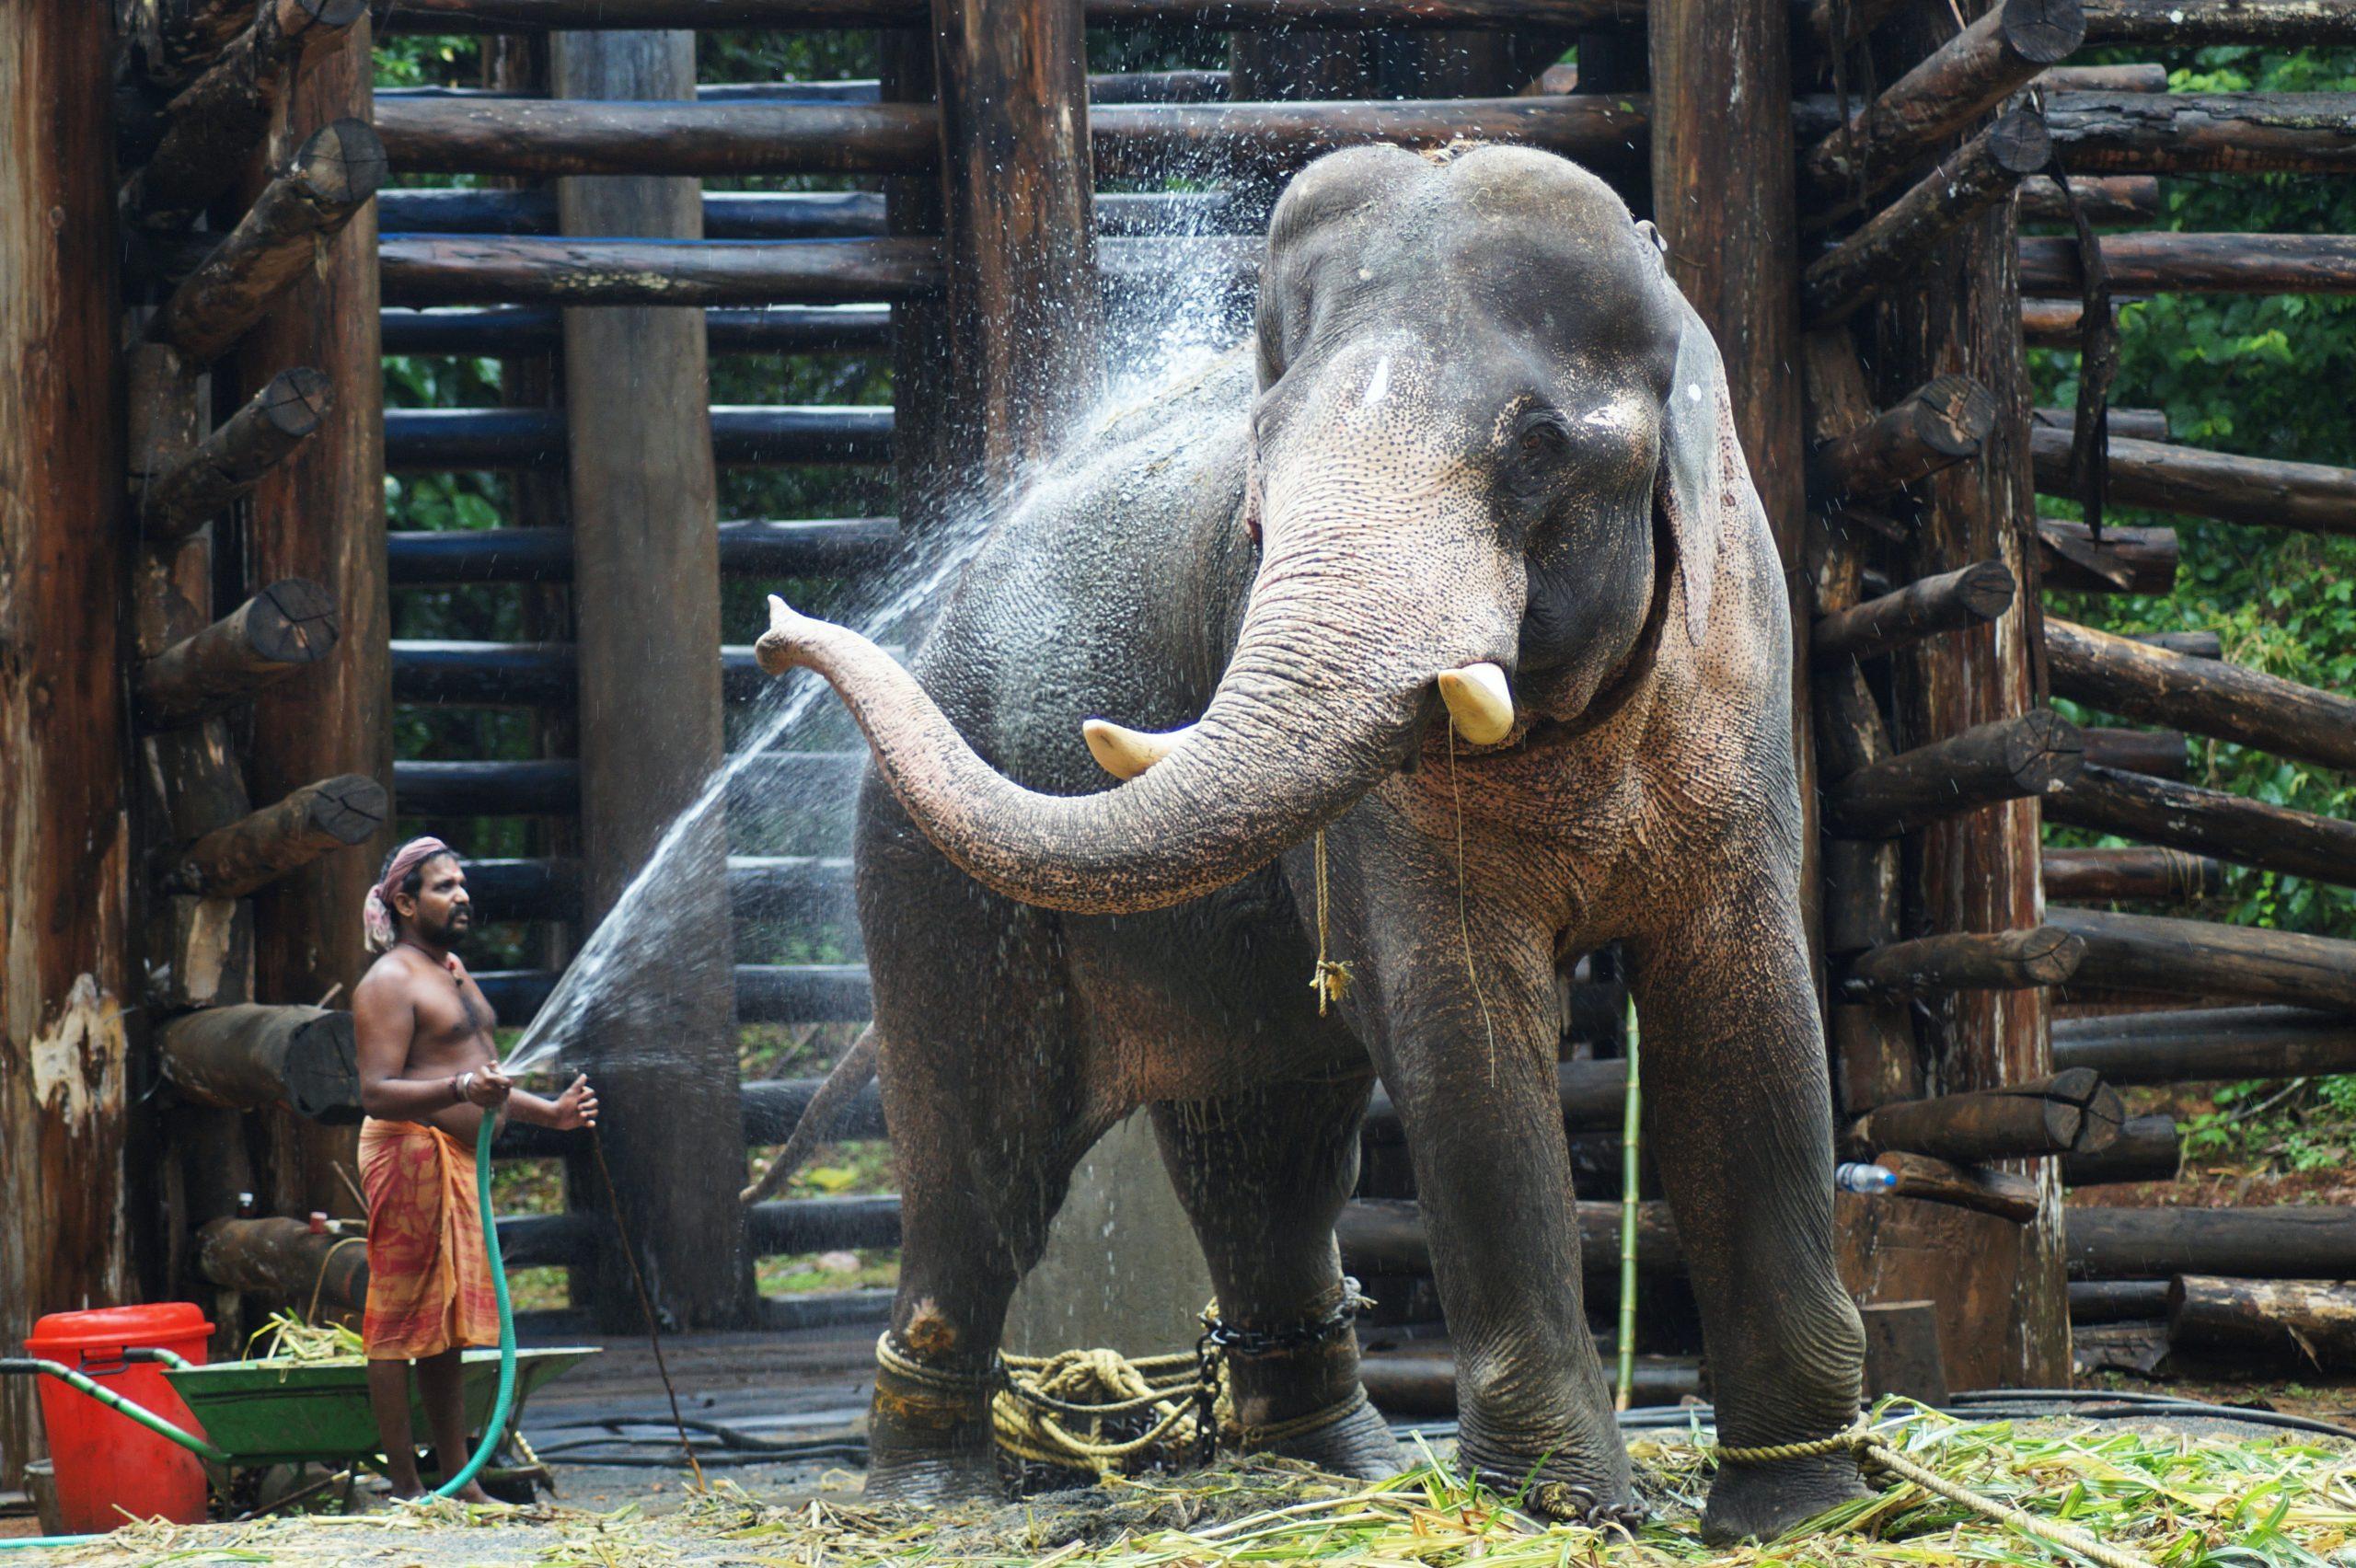 Gajah Wajib Ber-KTP dan Mandi 2,5 Jam Sehari!